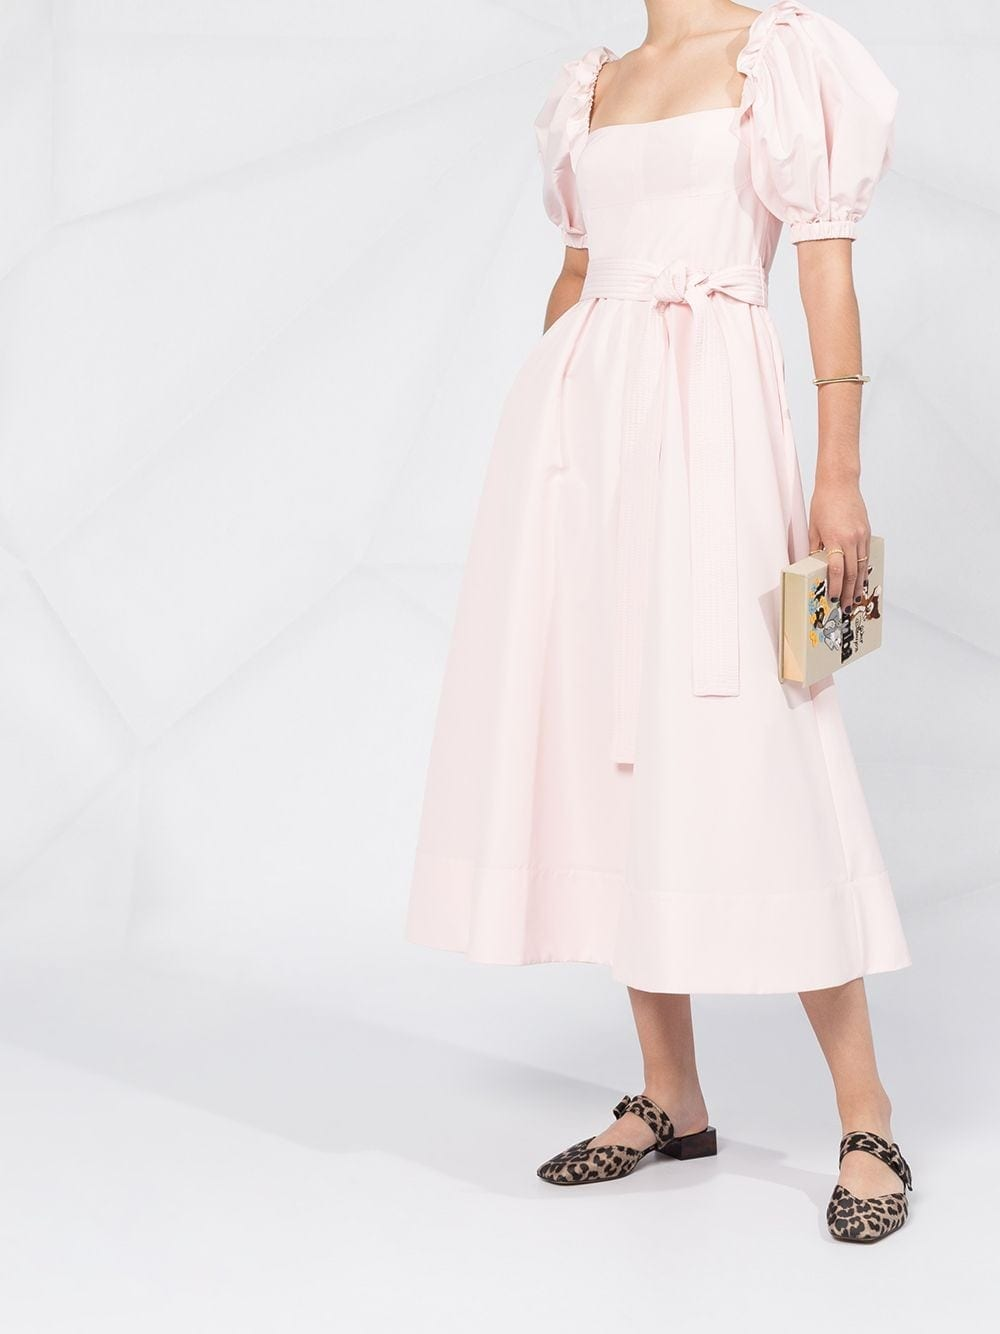 SELF-PORTRAIT Puff Sleeve Dress